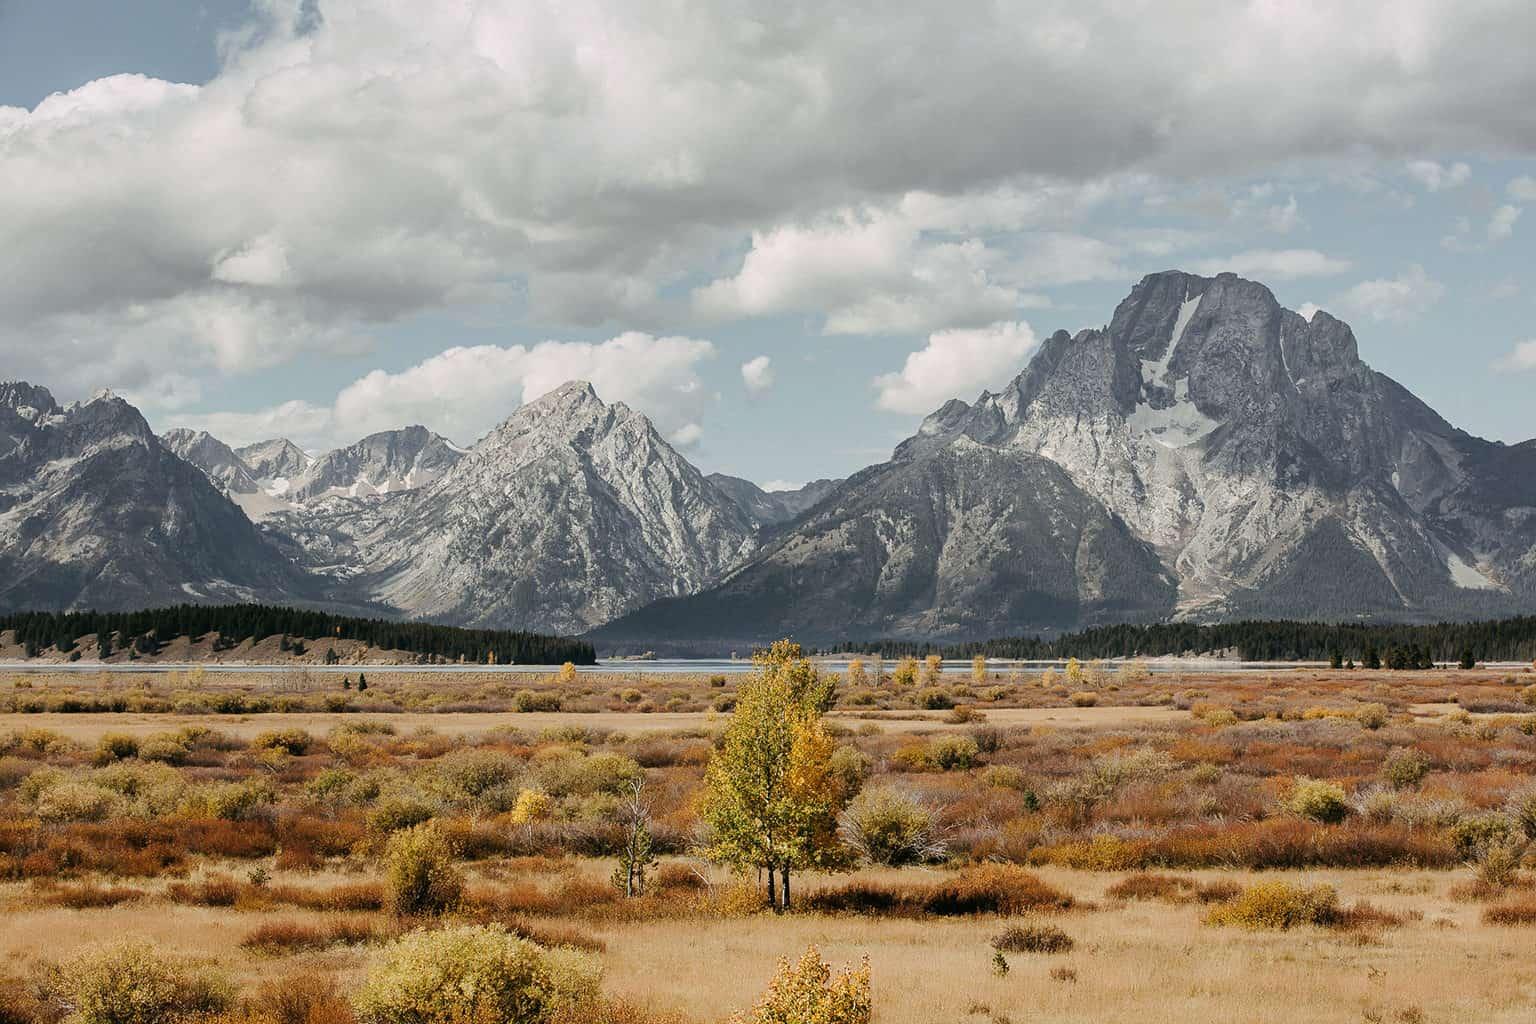 western states photo shoot location-2